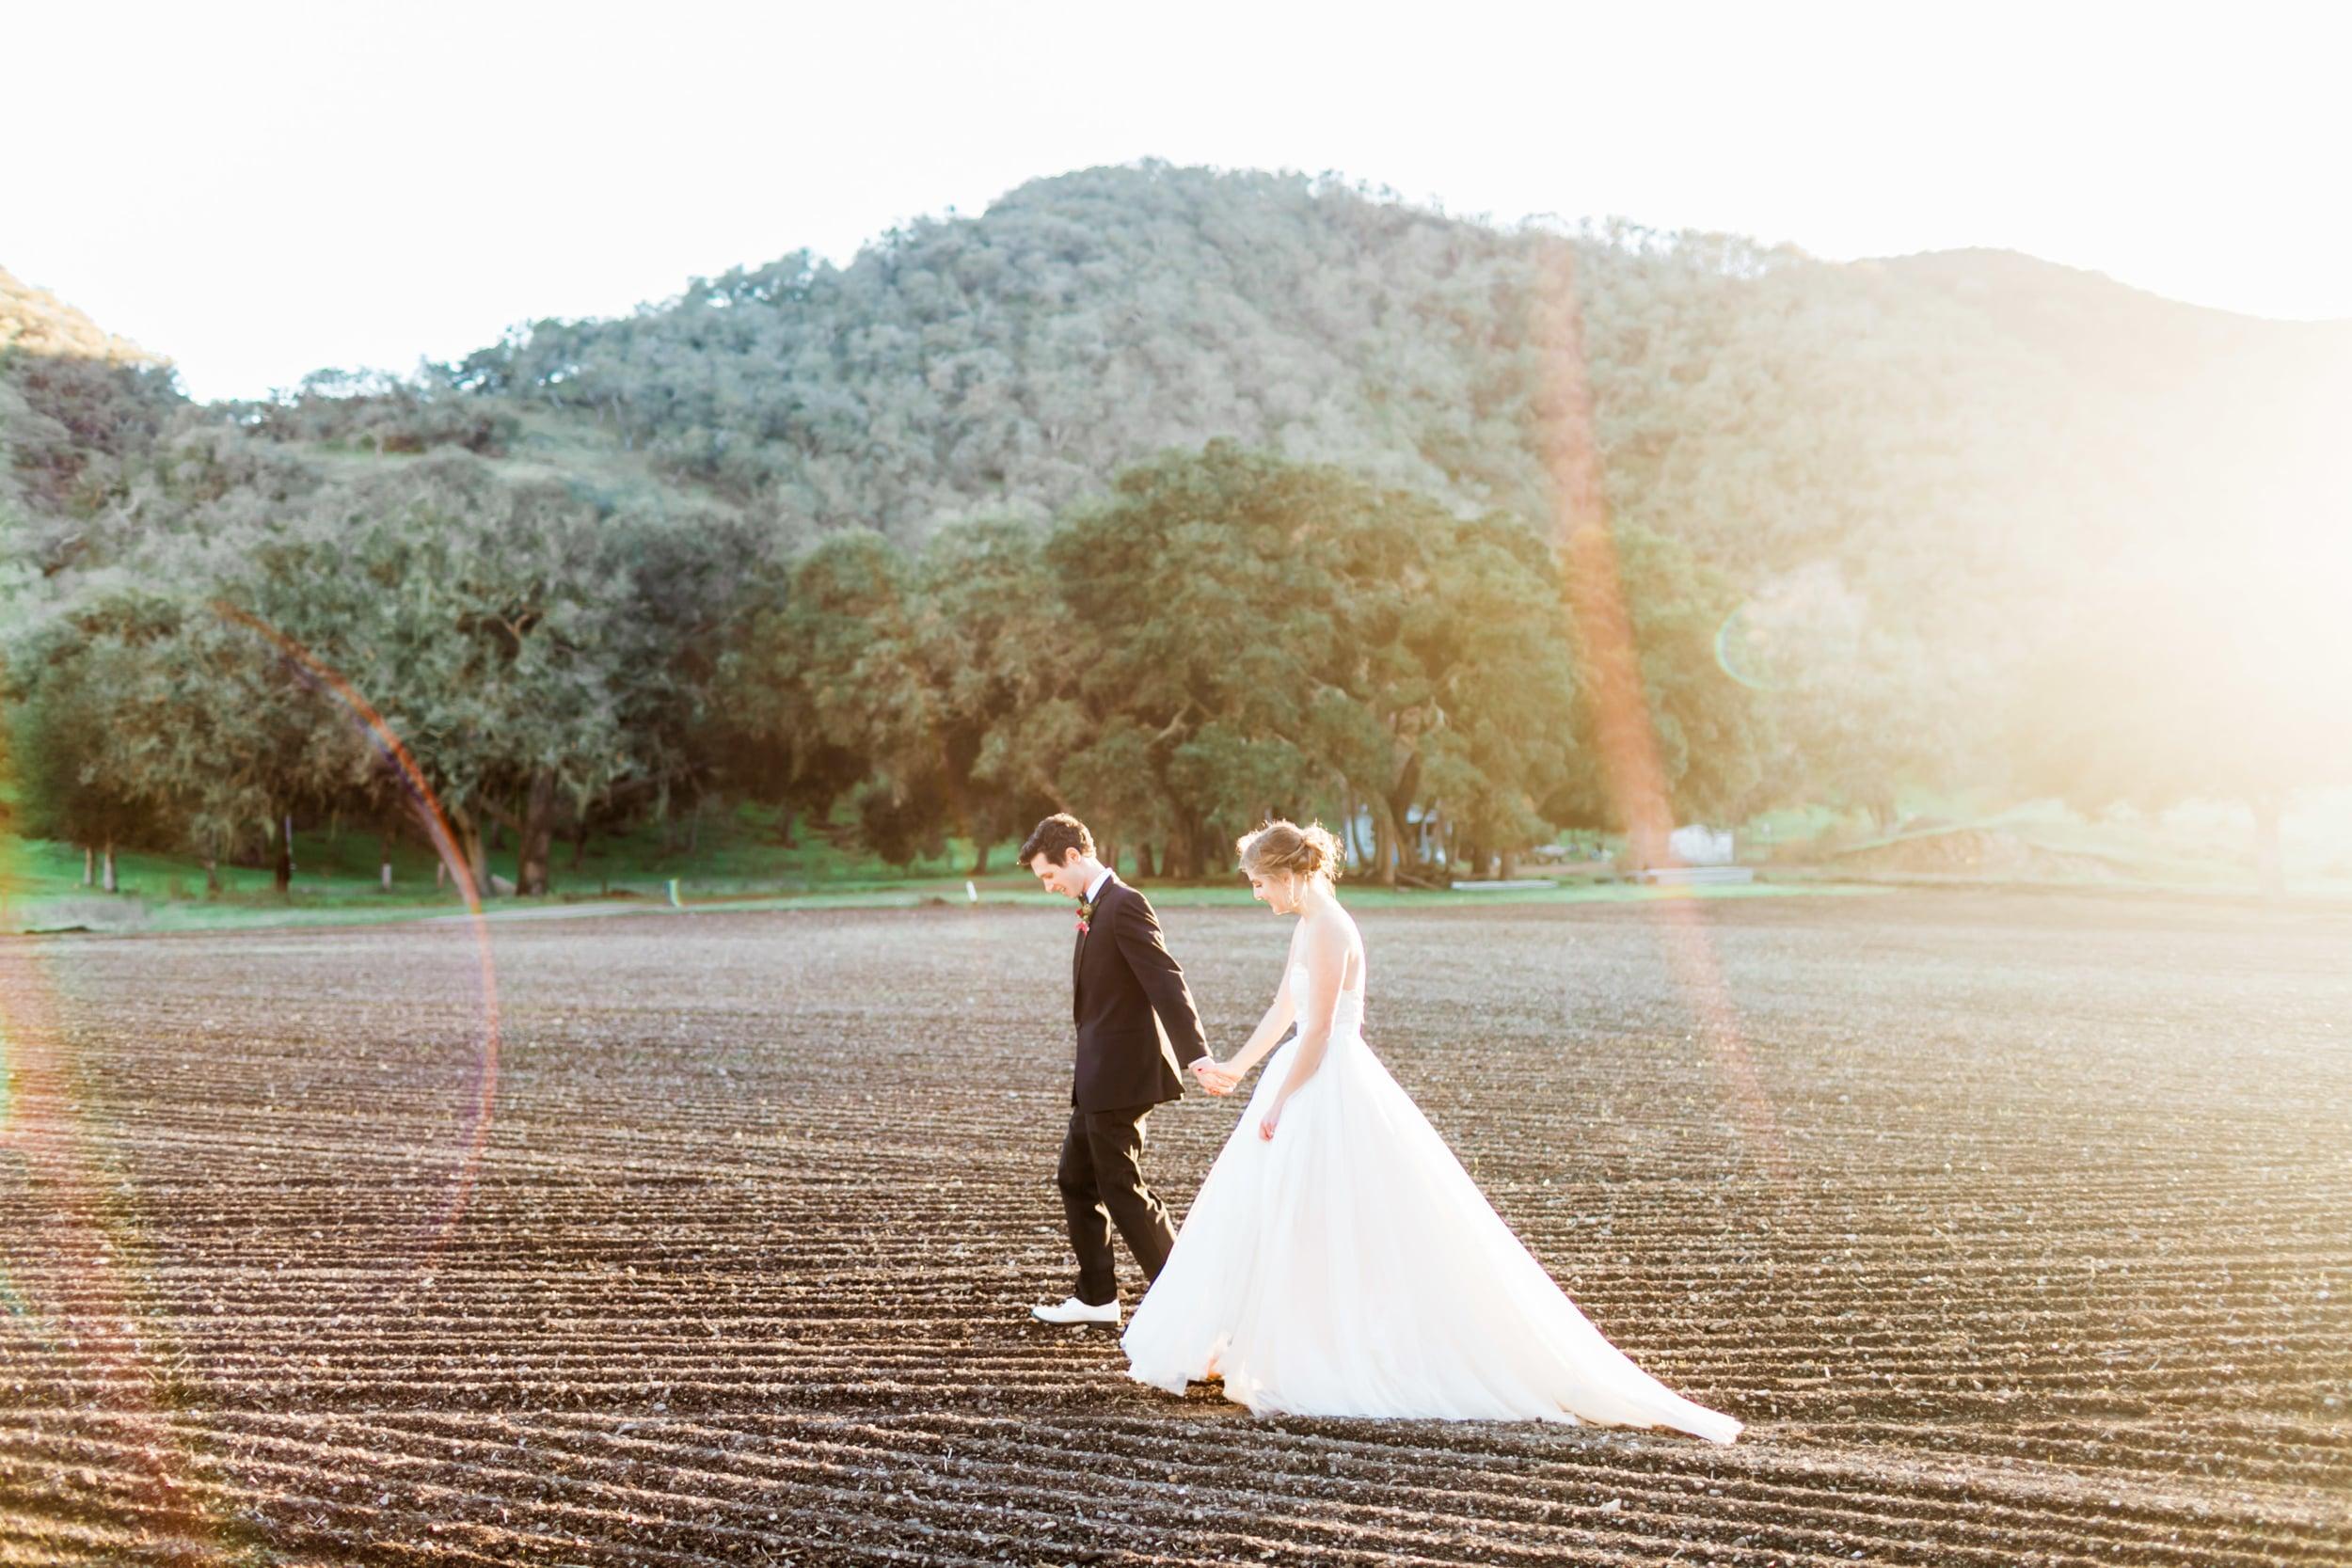 Natalie_Schutt_Photography_Winter_Wedding_San_Luis_Obispo-179.jpg